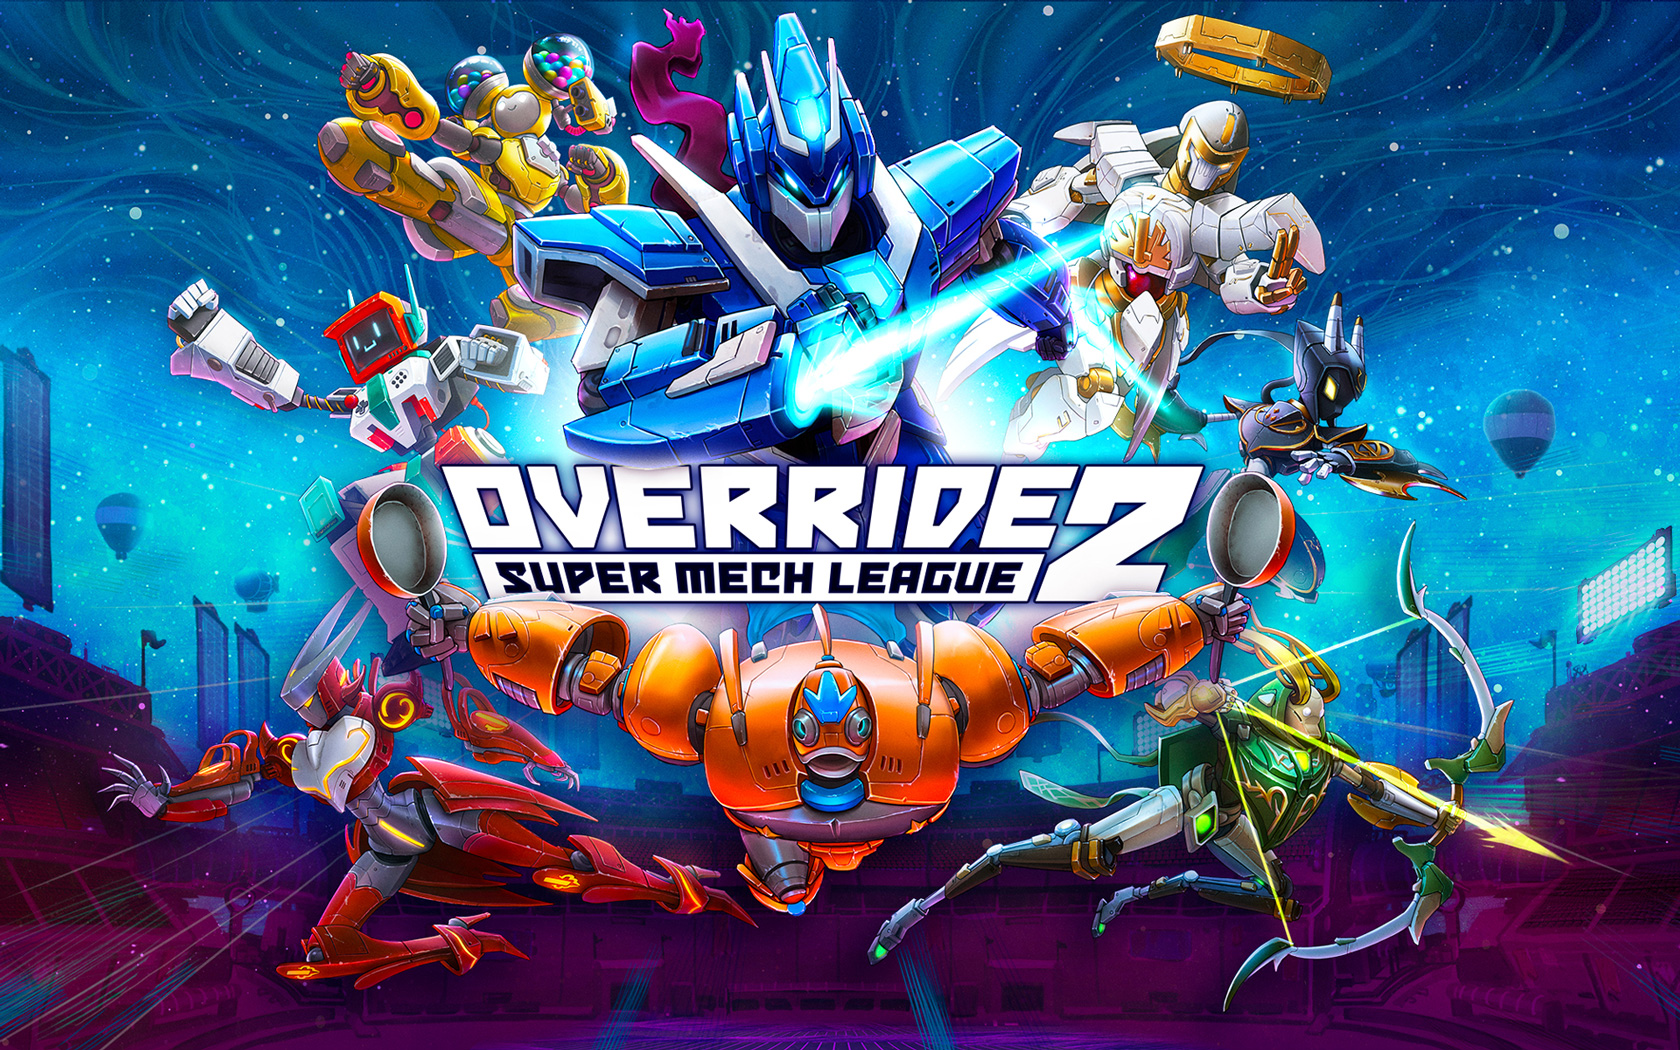 Override 2: Super Mech League Wallpaper in 1680x1050